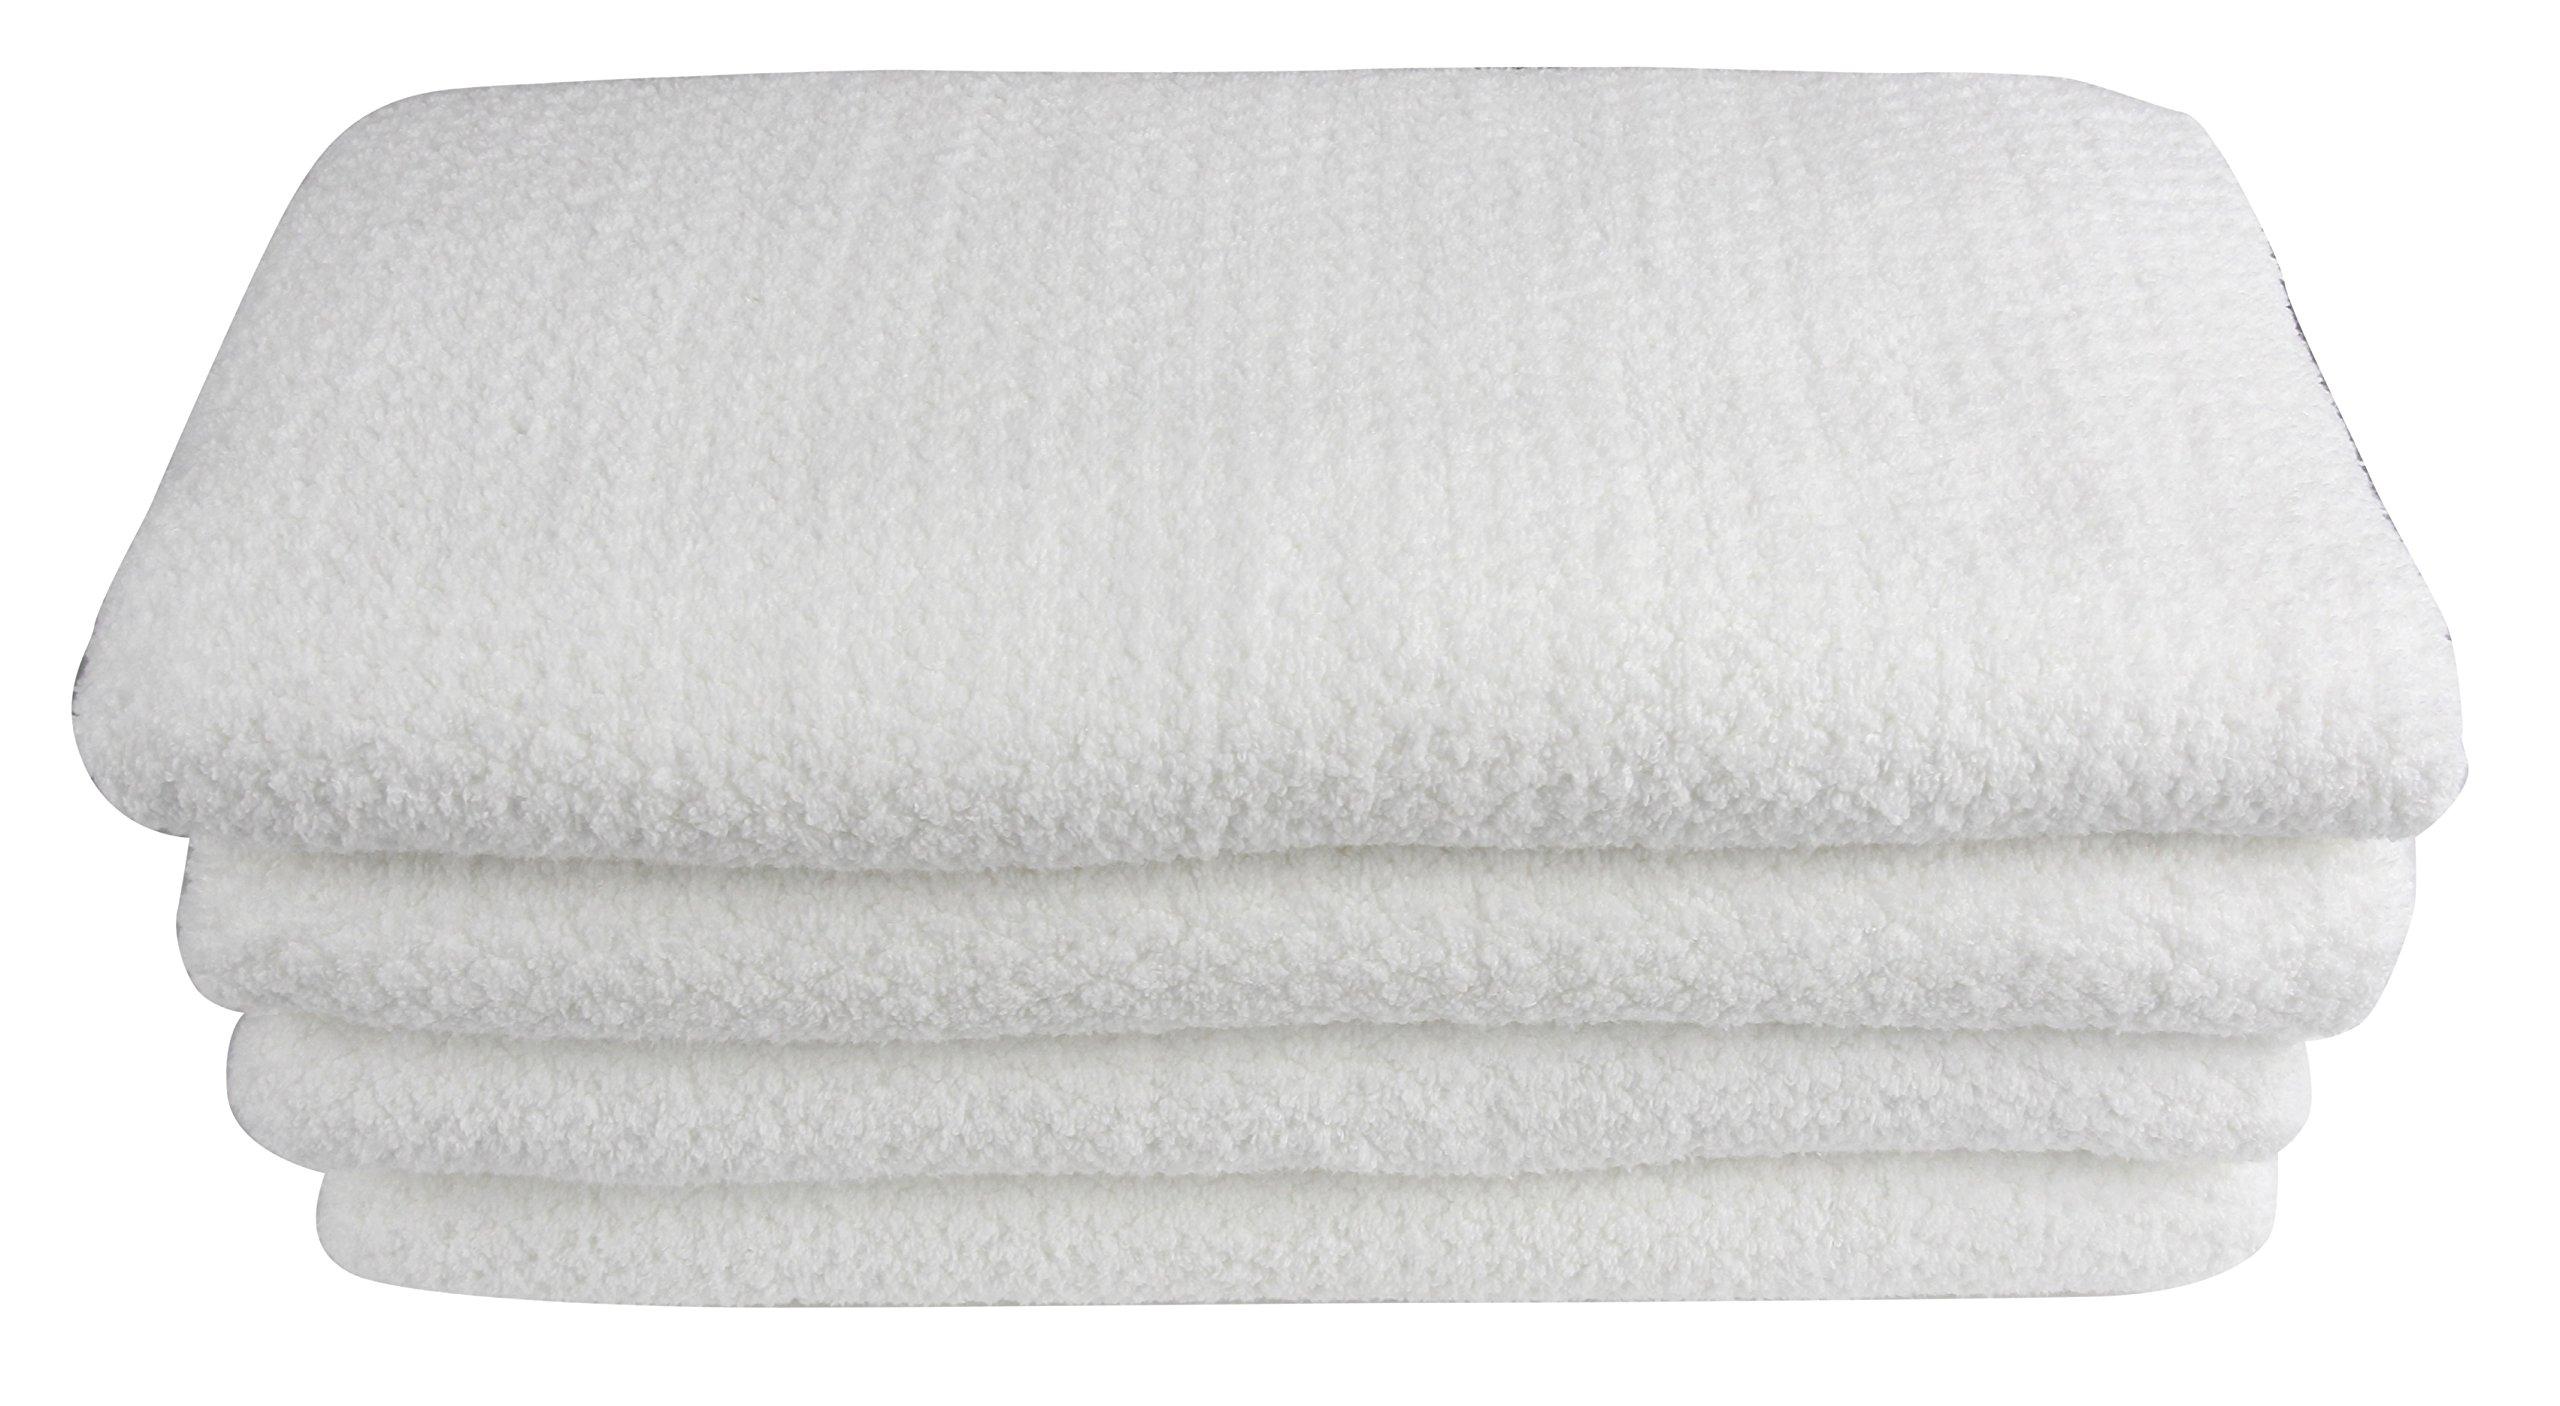 Everplush Diamond Jacquard Bath Sheet 2 Pack in White by Everplush (Image #1)